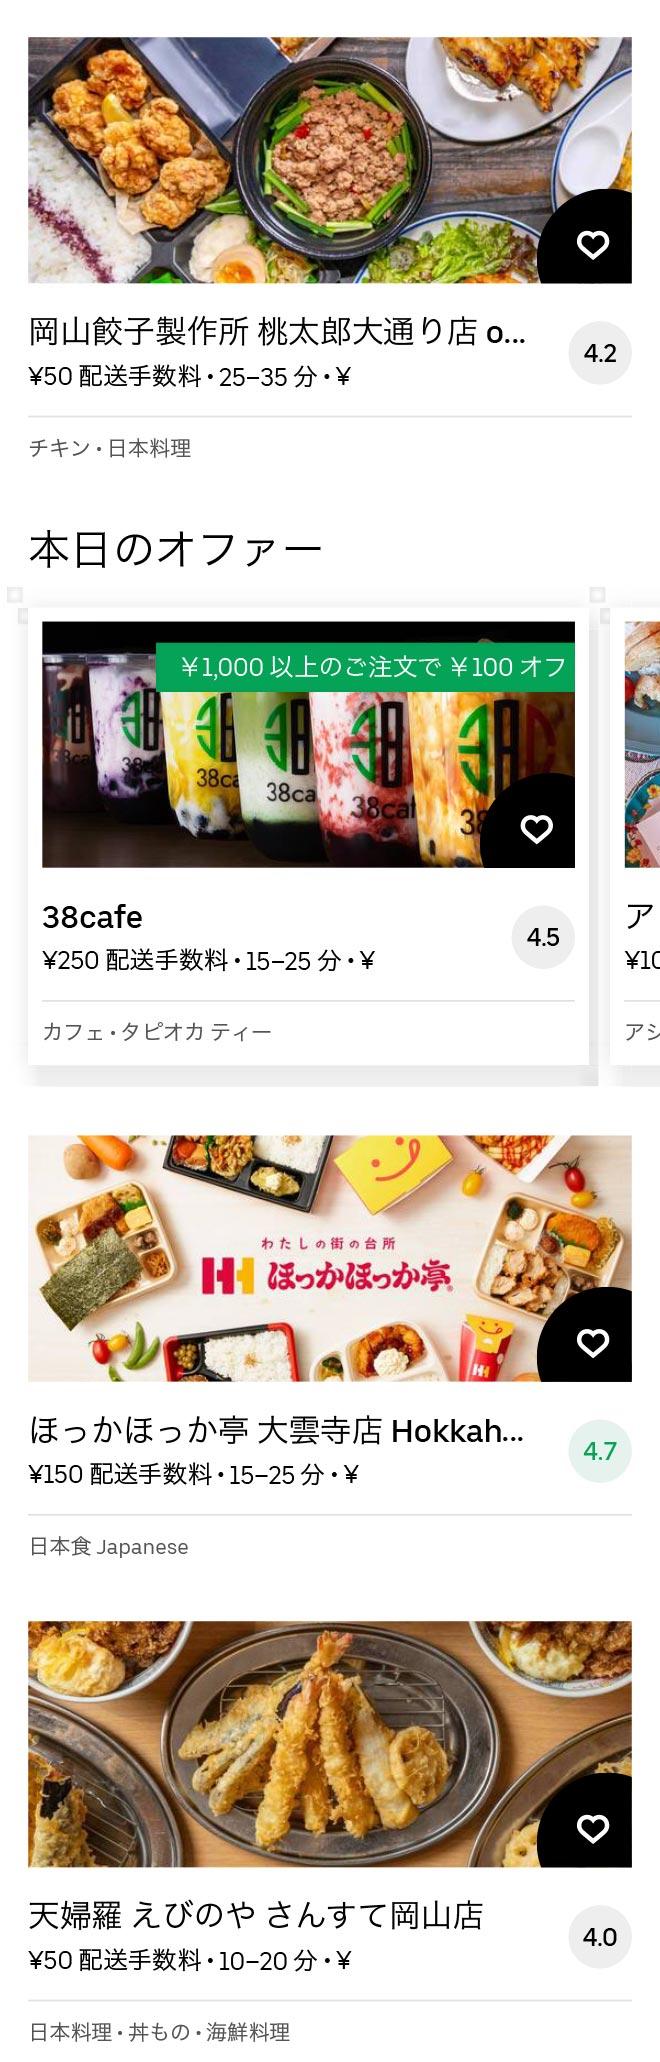 Okayama menu 2011 08